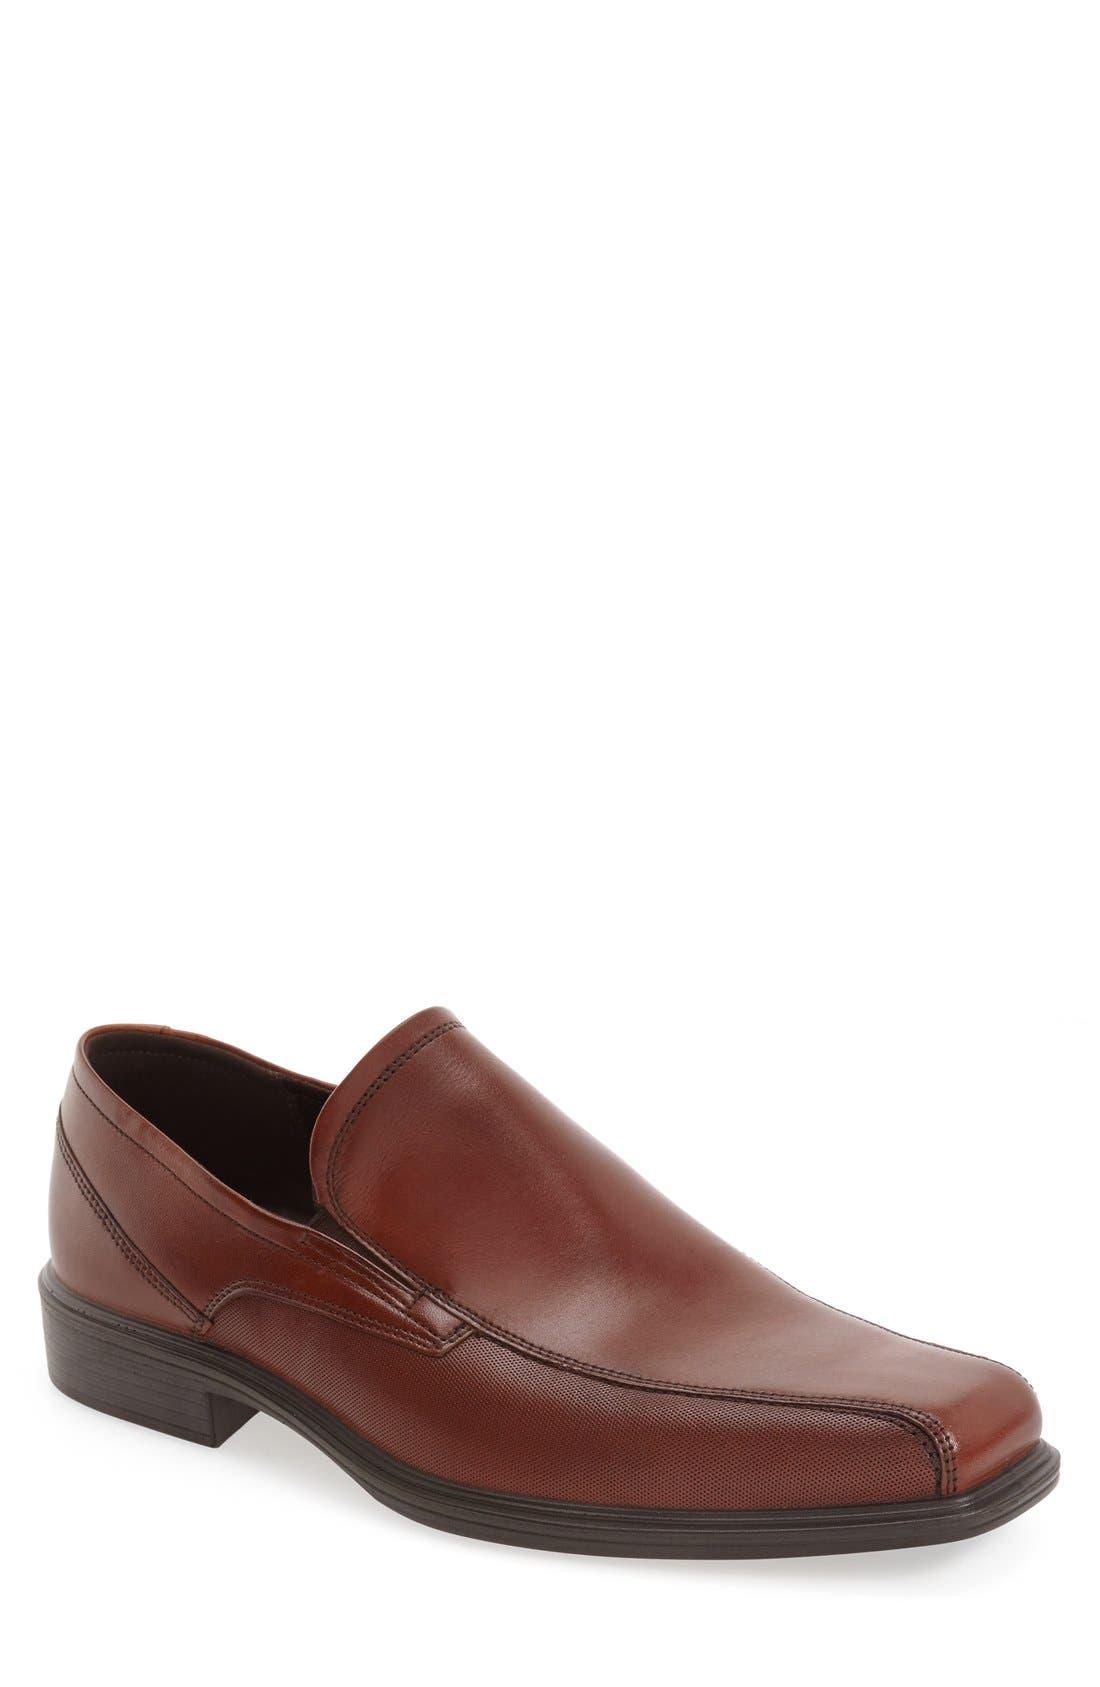 'Johannesburg' Venetian Loafer,                             Main thumbnail 1, color,                             Cognac Leather